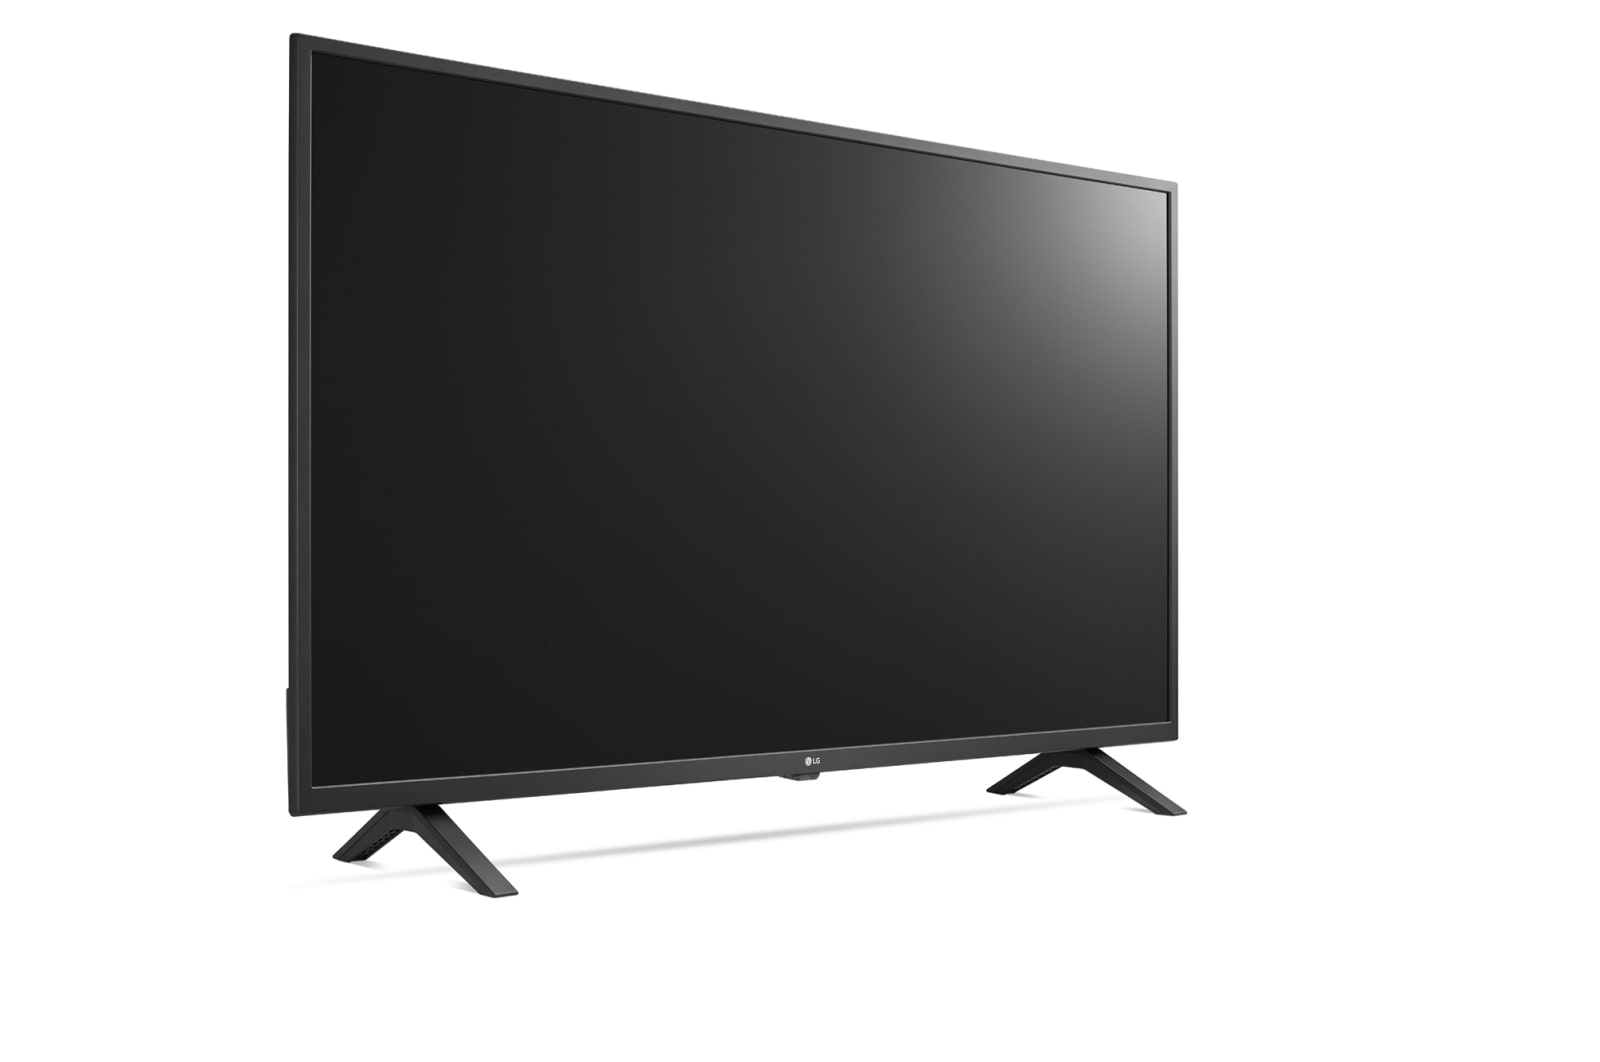 Обзор телевизора Lg 55un70006la